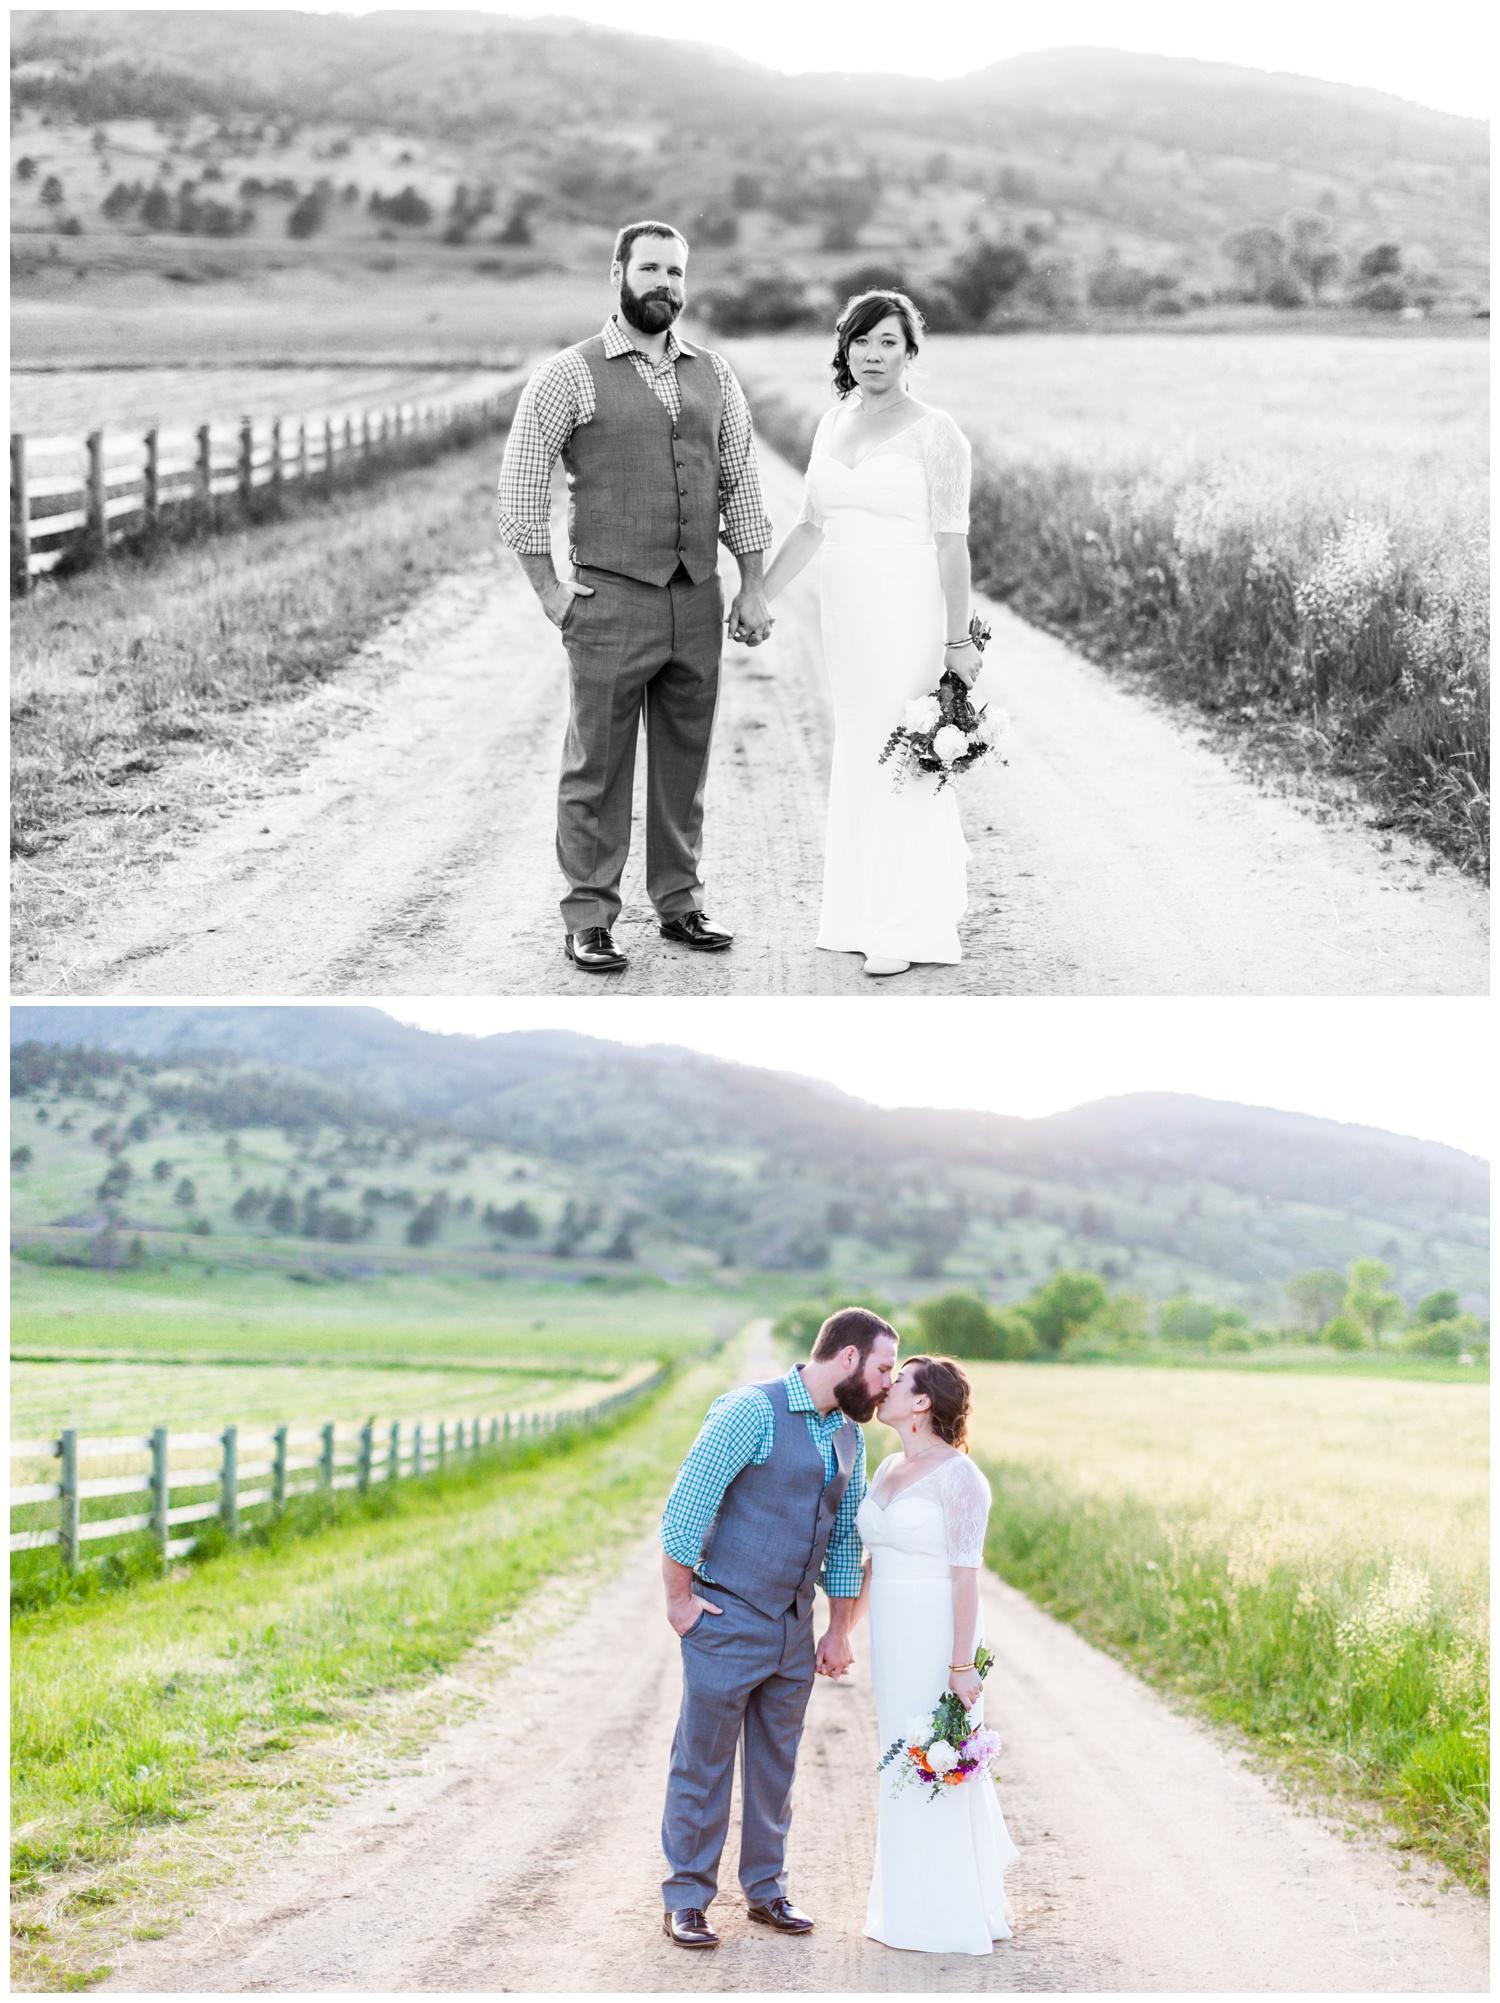 Sylvan Dale Guest Ranch Wedding Photographer024.jpg